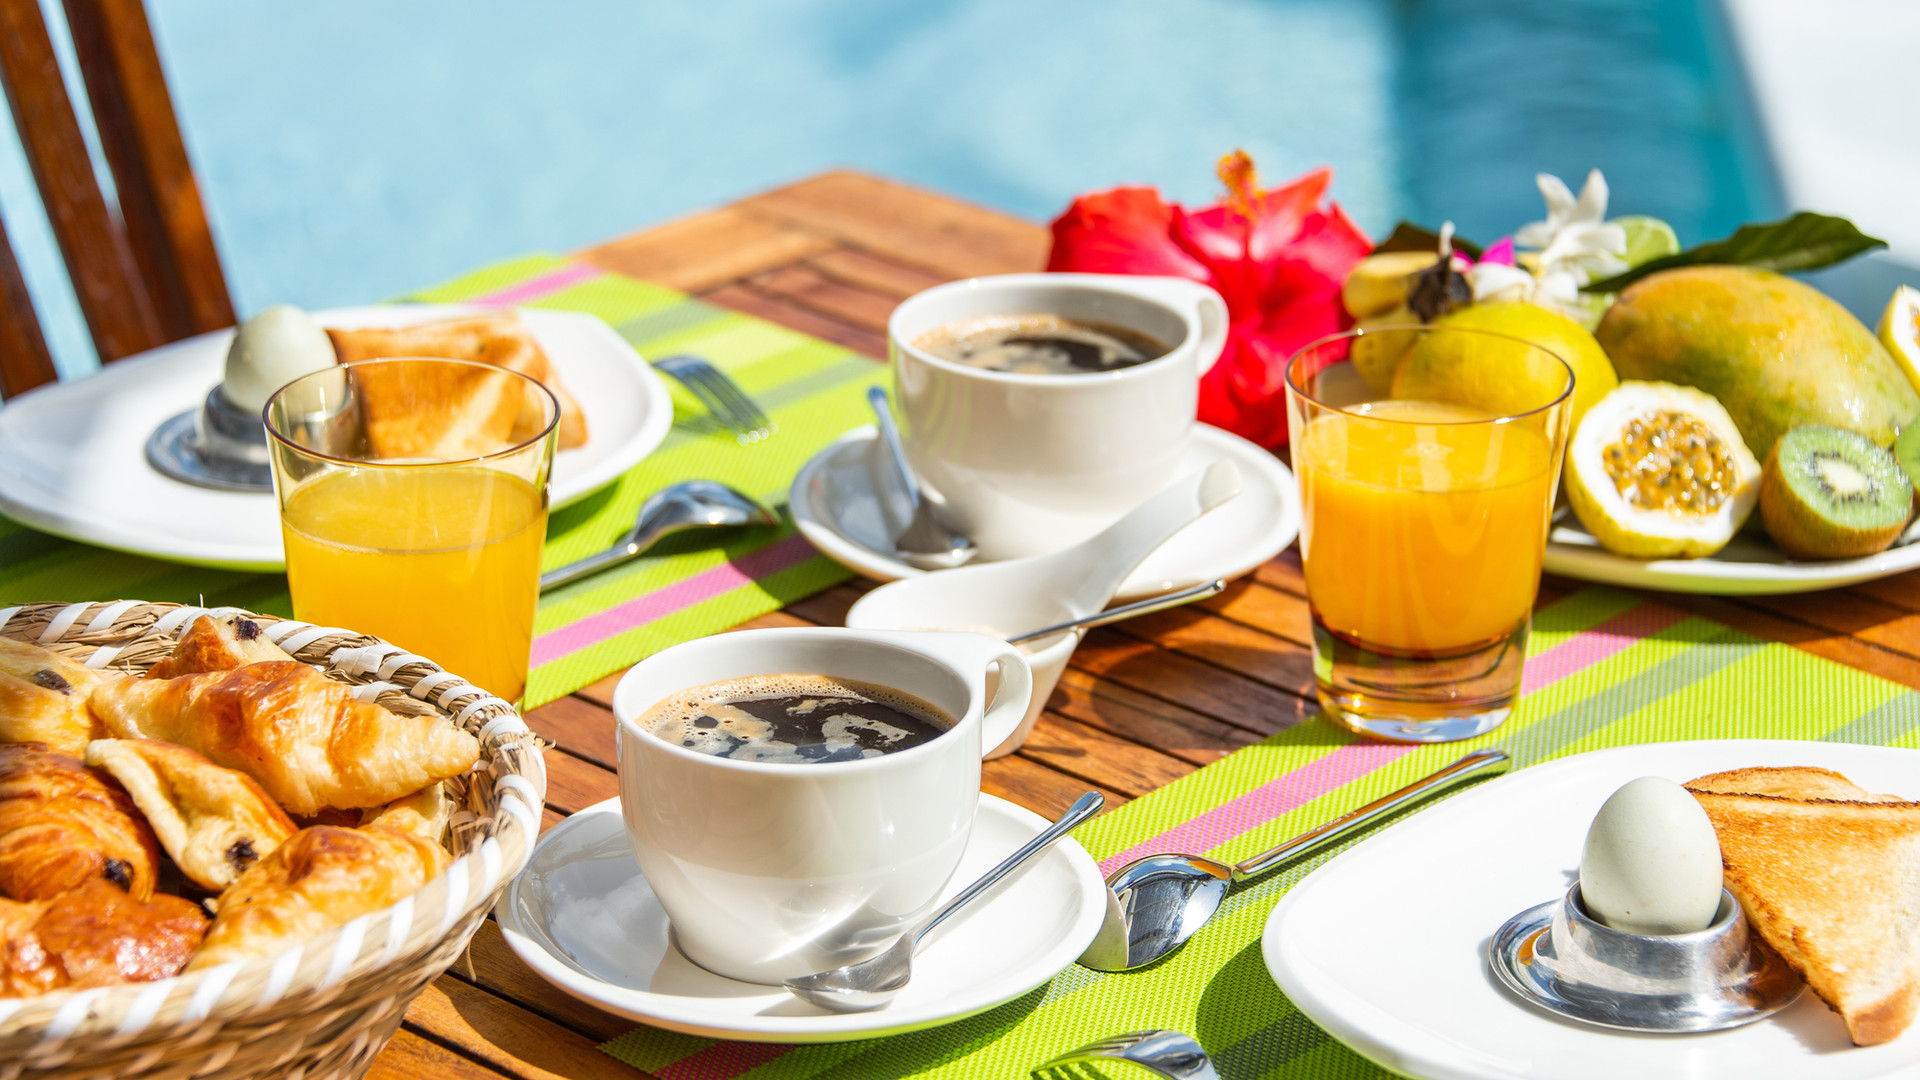 breakfast_cafeÌ _croissant_fruit_oe